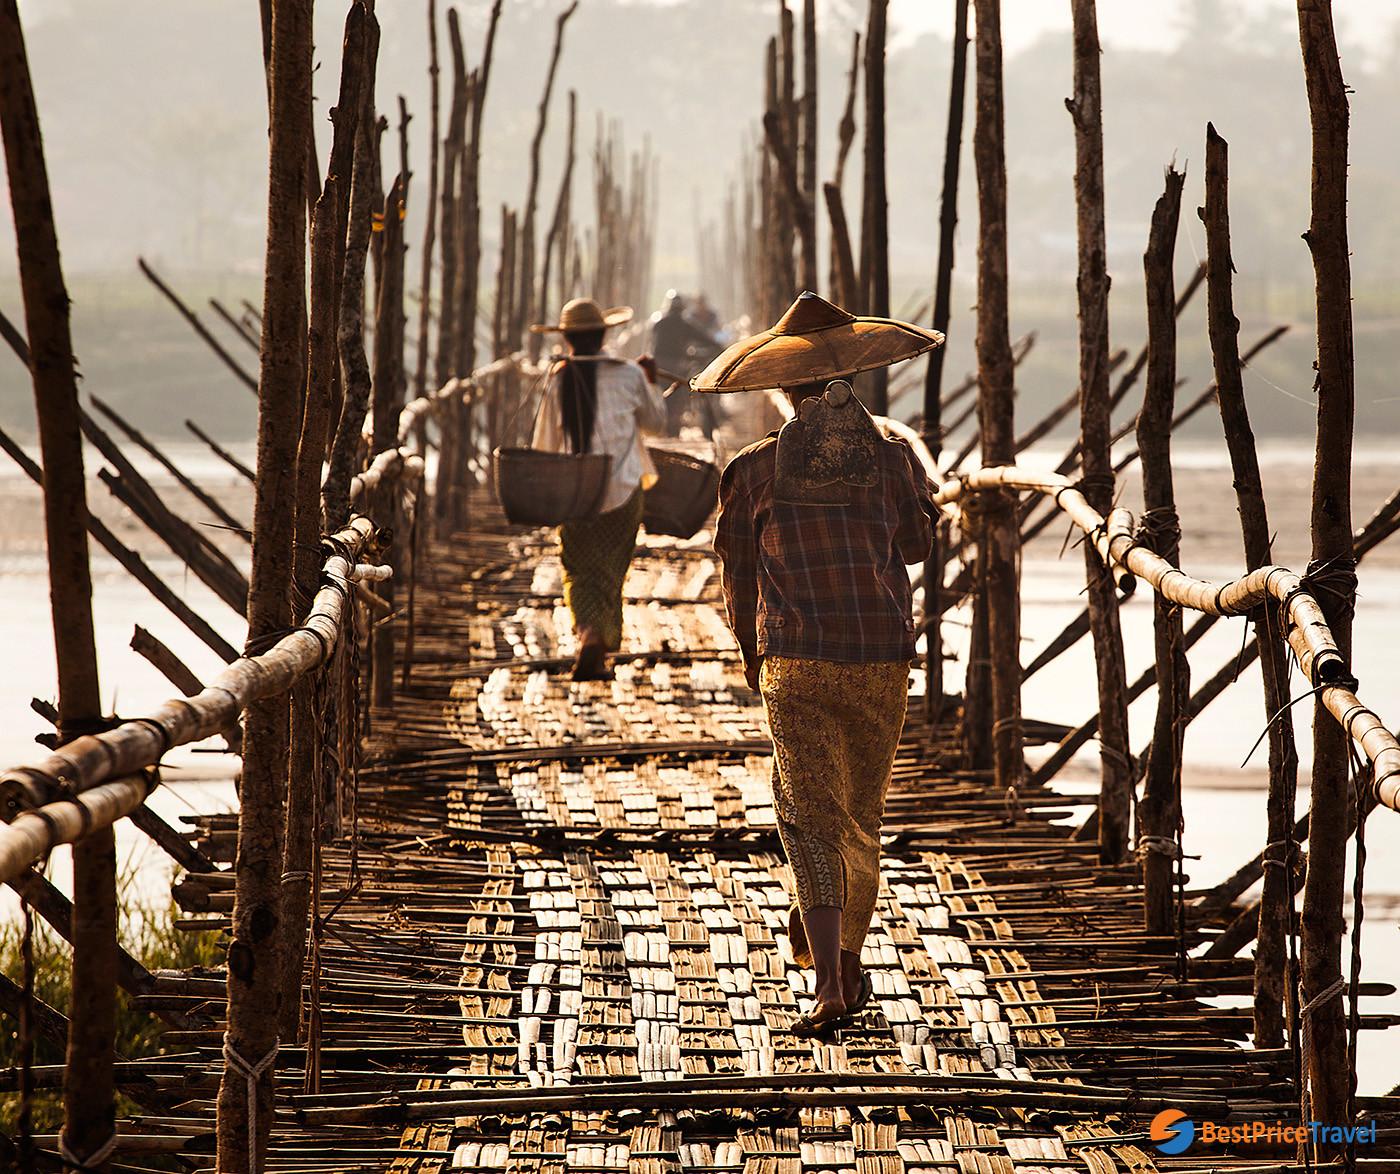 The Bamboo Bridge in Bhamo